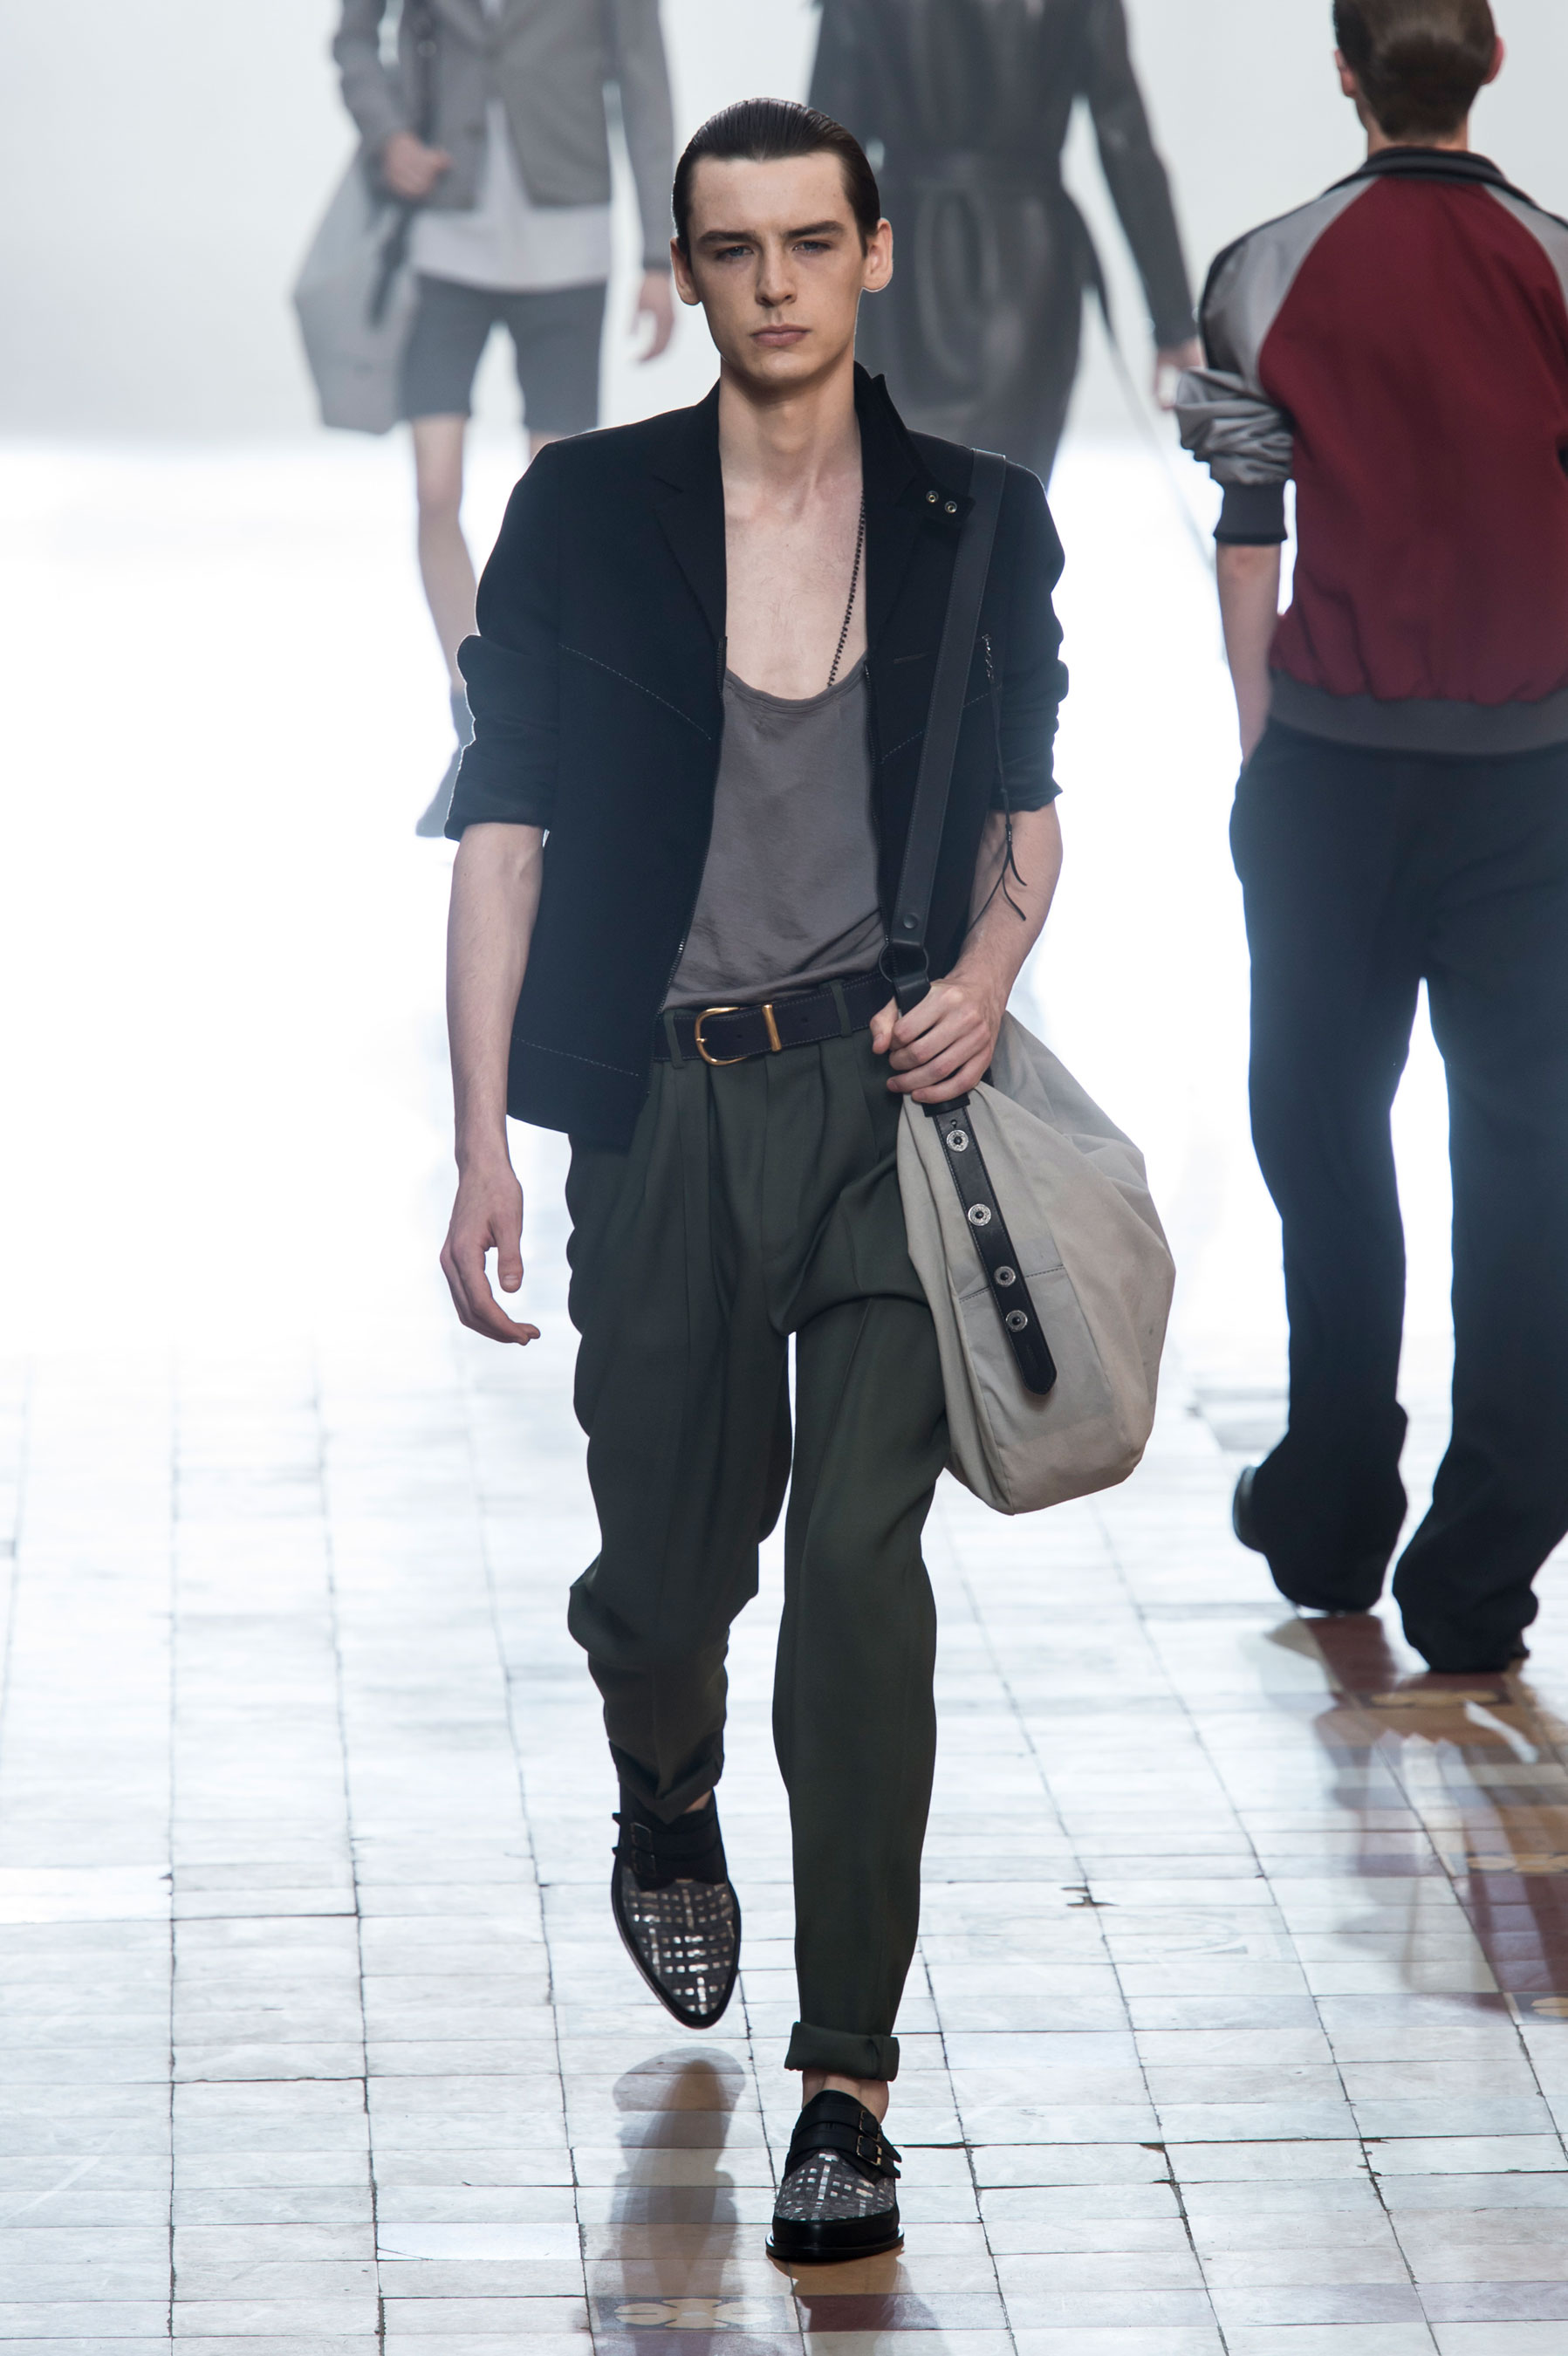 Lanvin Spring/Summer 2016 Menswear Collection | Paris Fashion Week